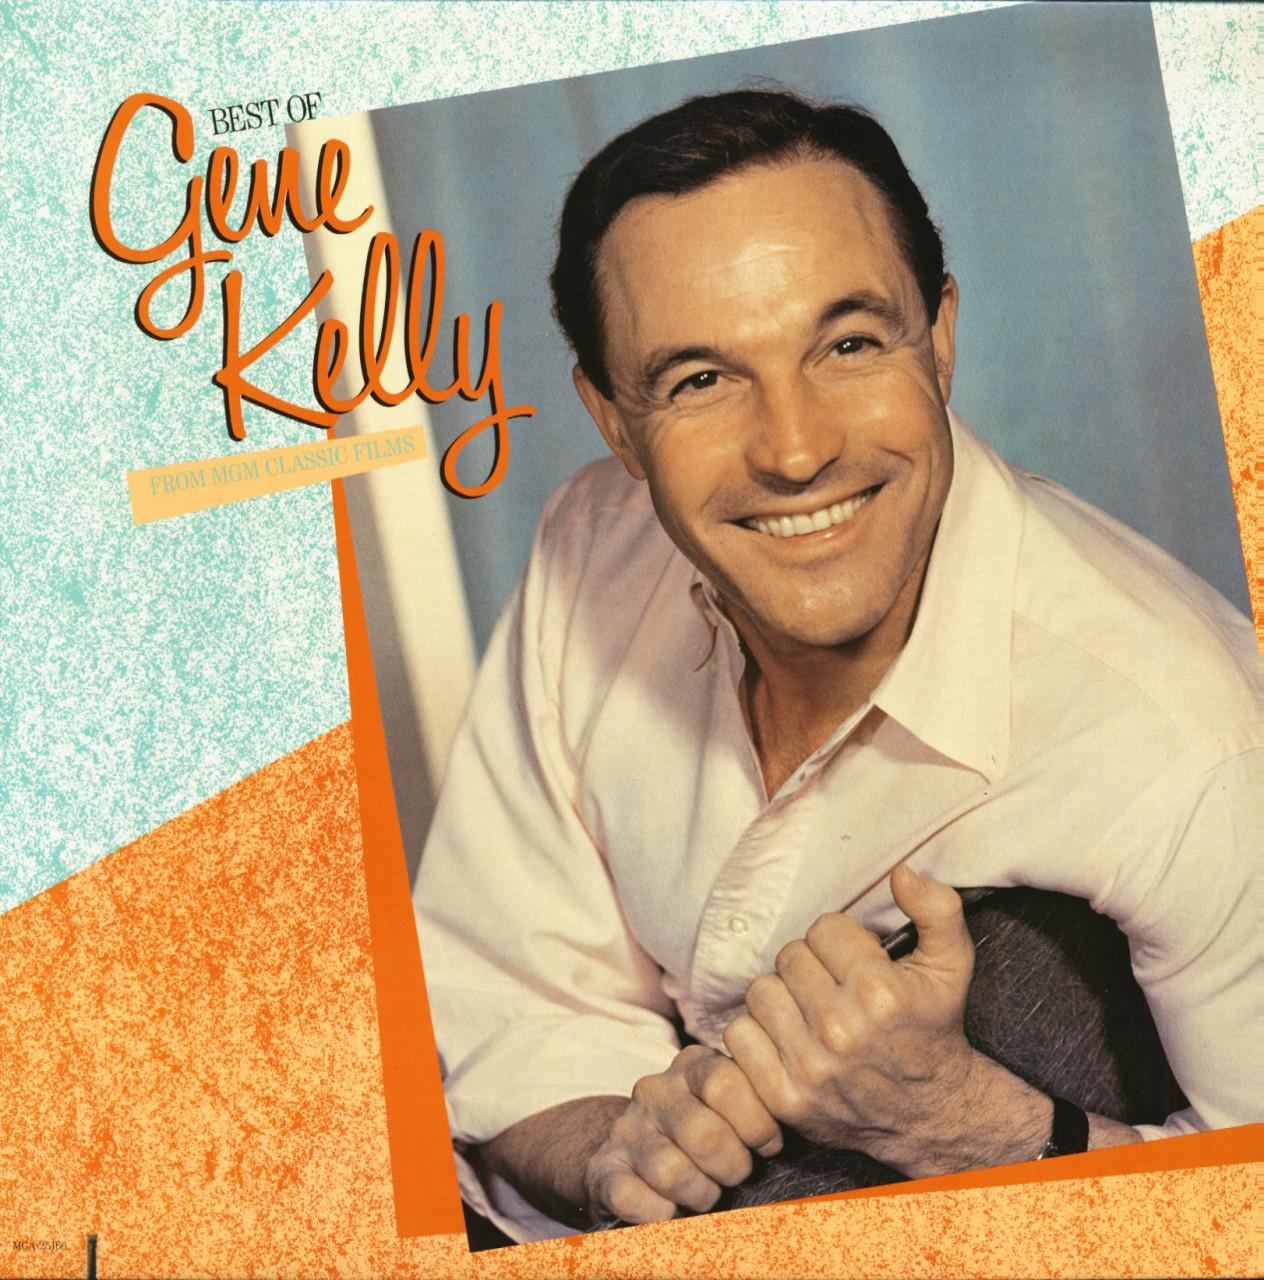 Gene Kelly - Best Of Gene Kelly From MGM Classic Films (LP)